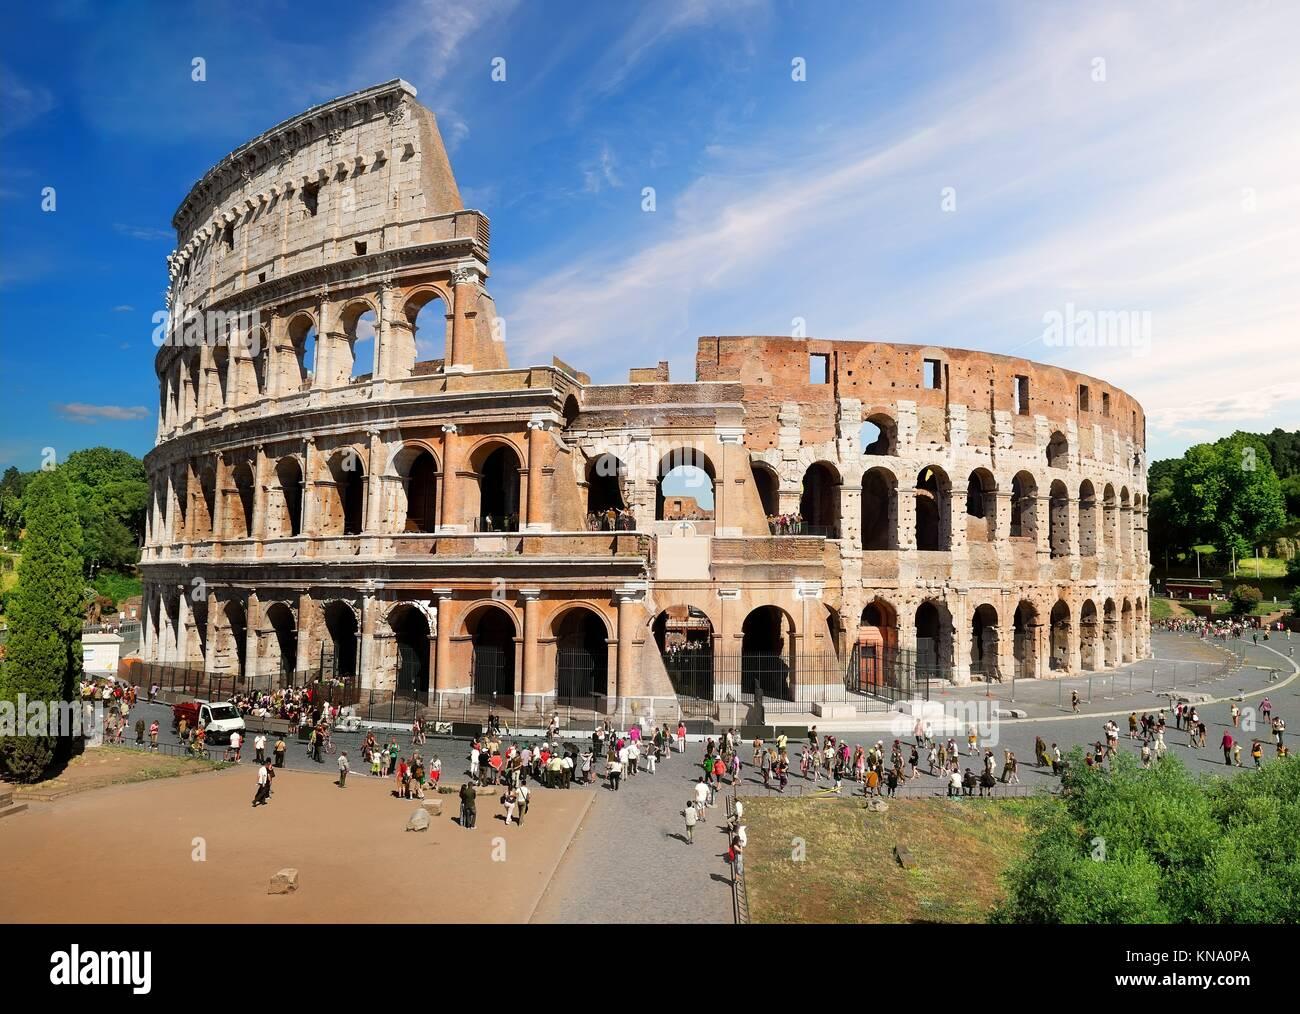 Schönen römischen Kolosseum im Sommer Tag, Italien. Stockbild